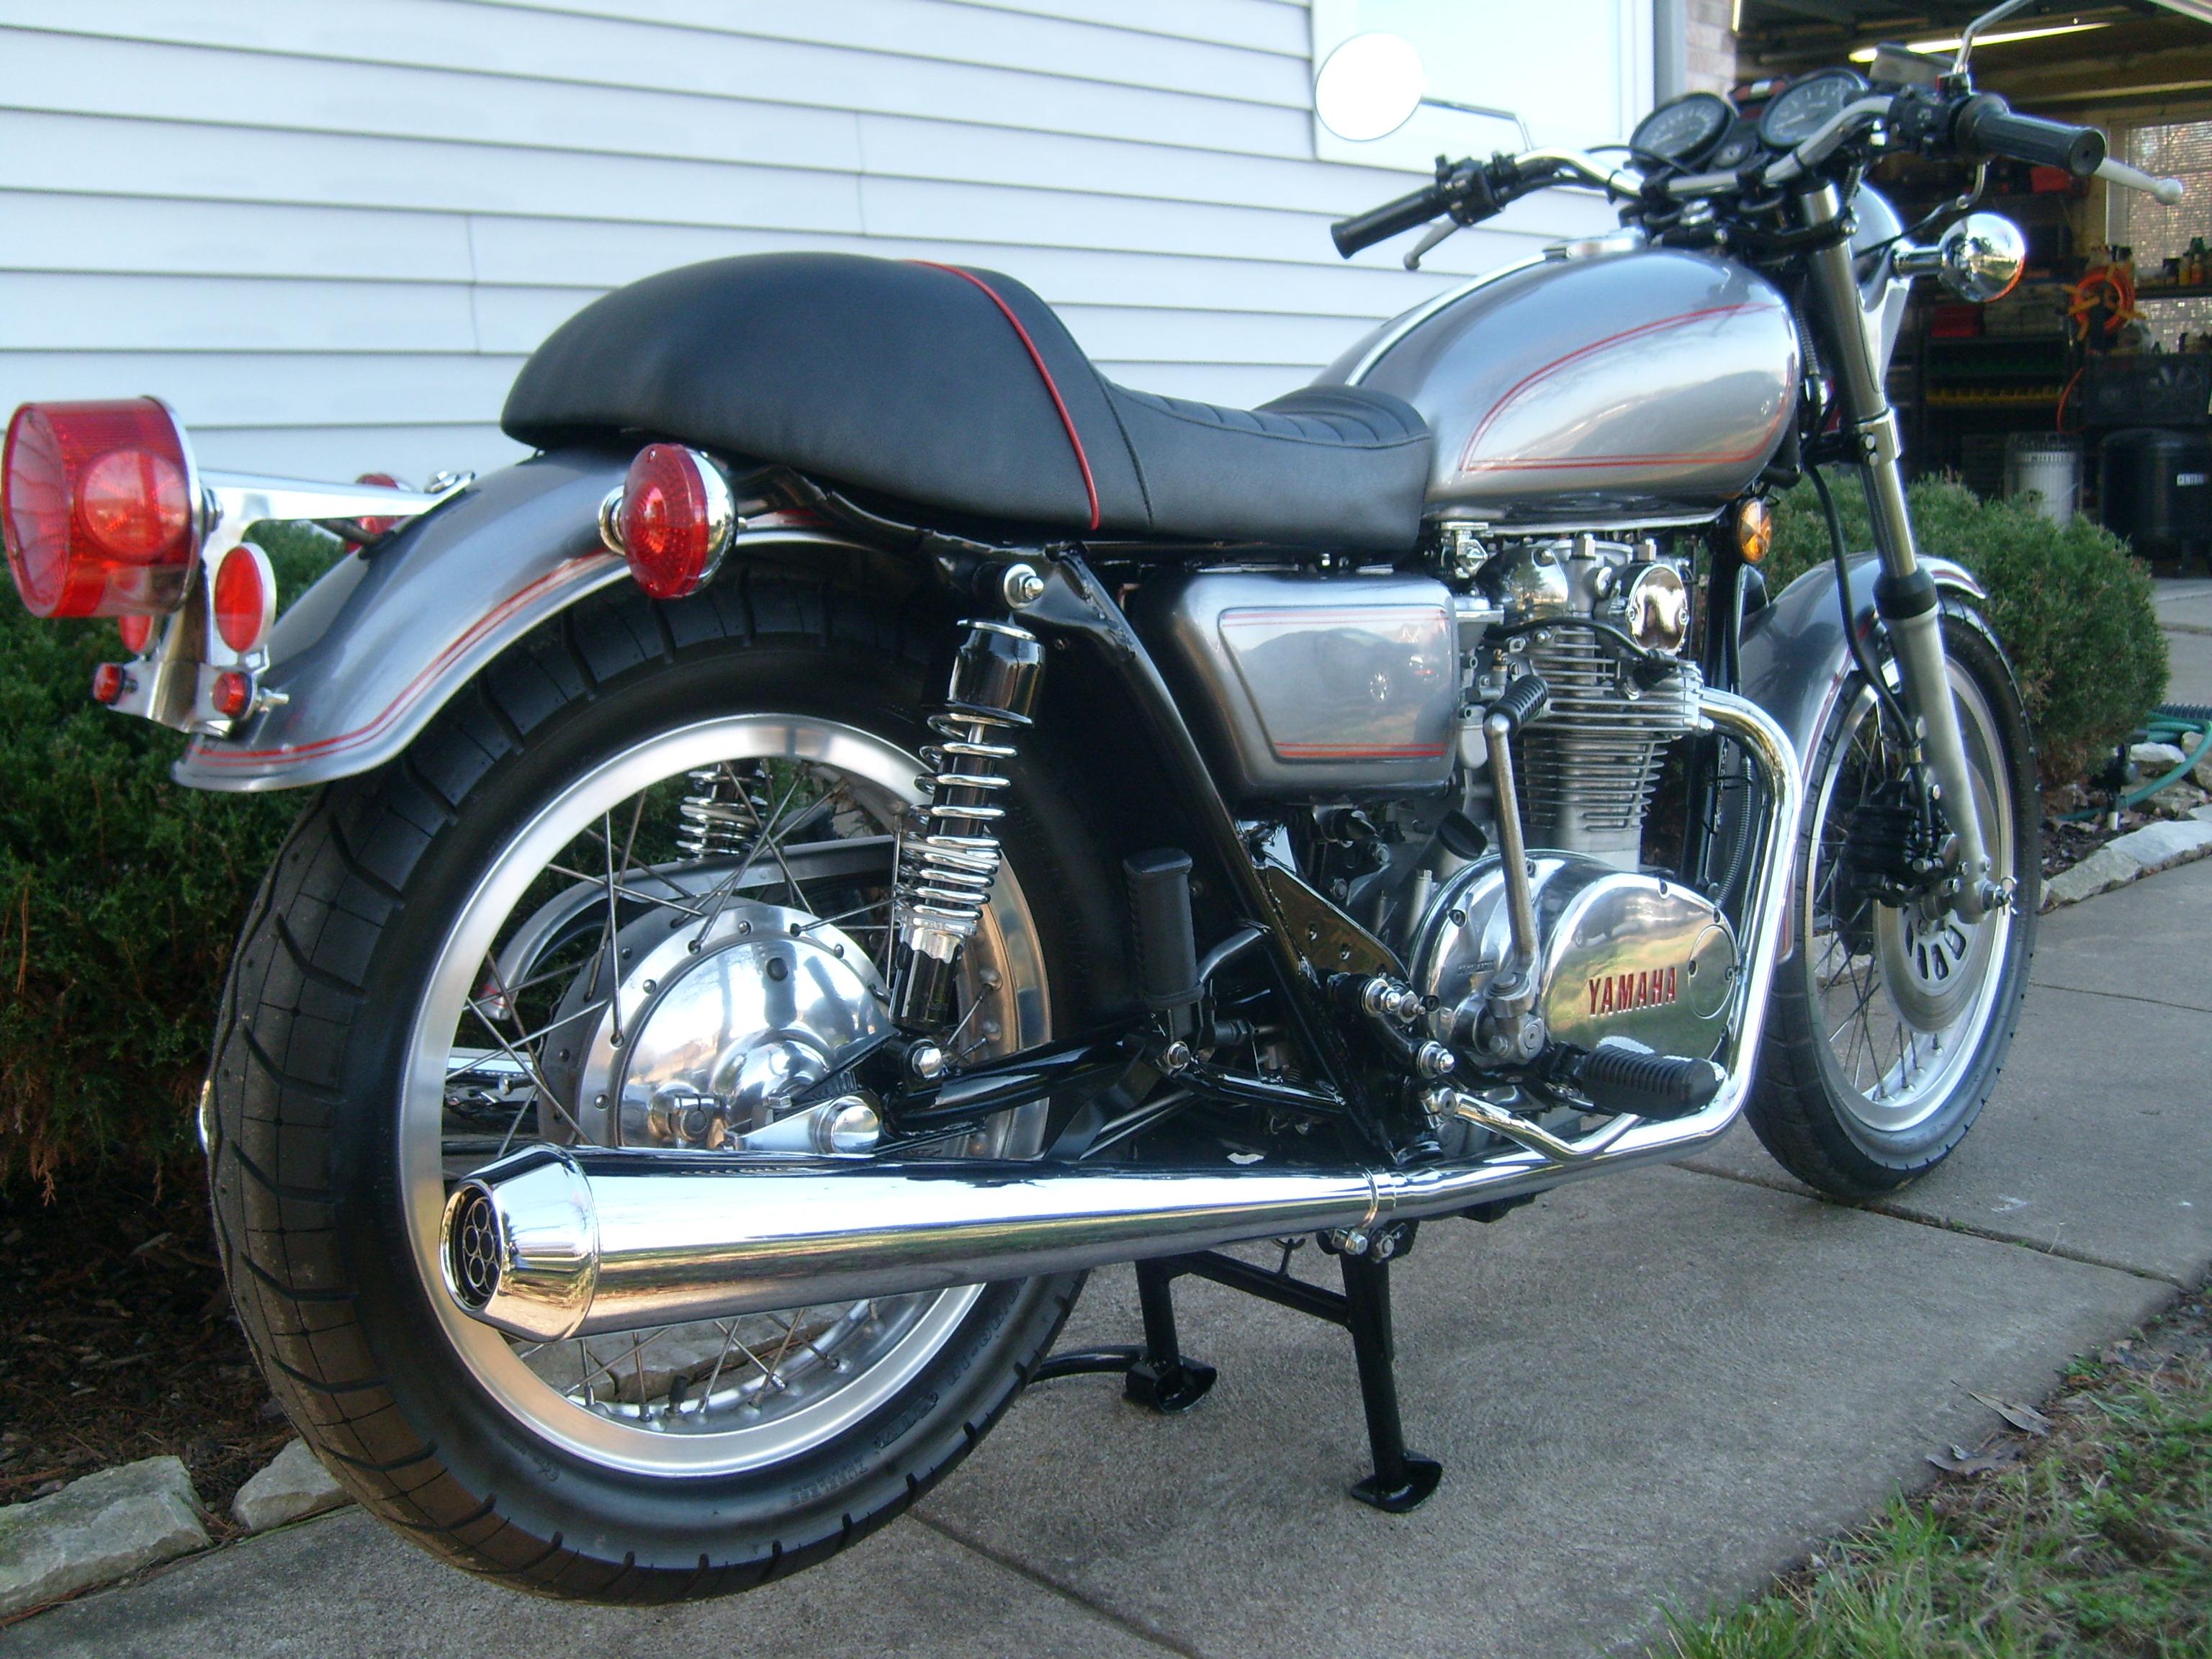 1977 Yamaha Xs650 For Sale - Foto Yamaha Best Contest